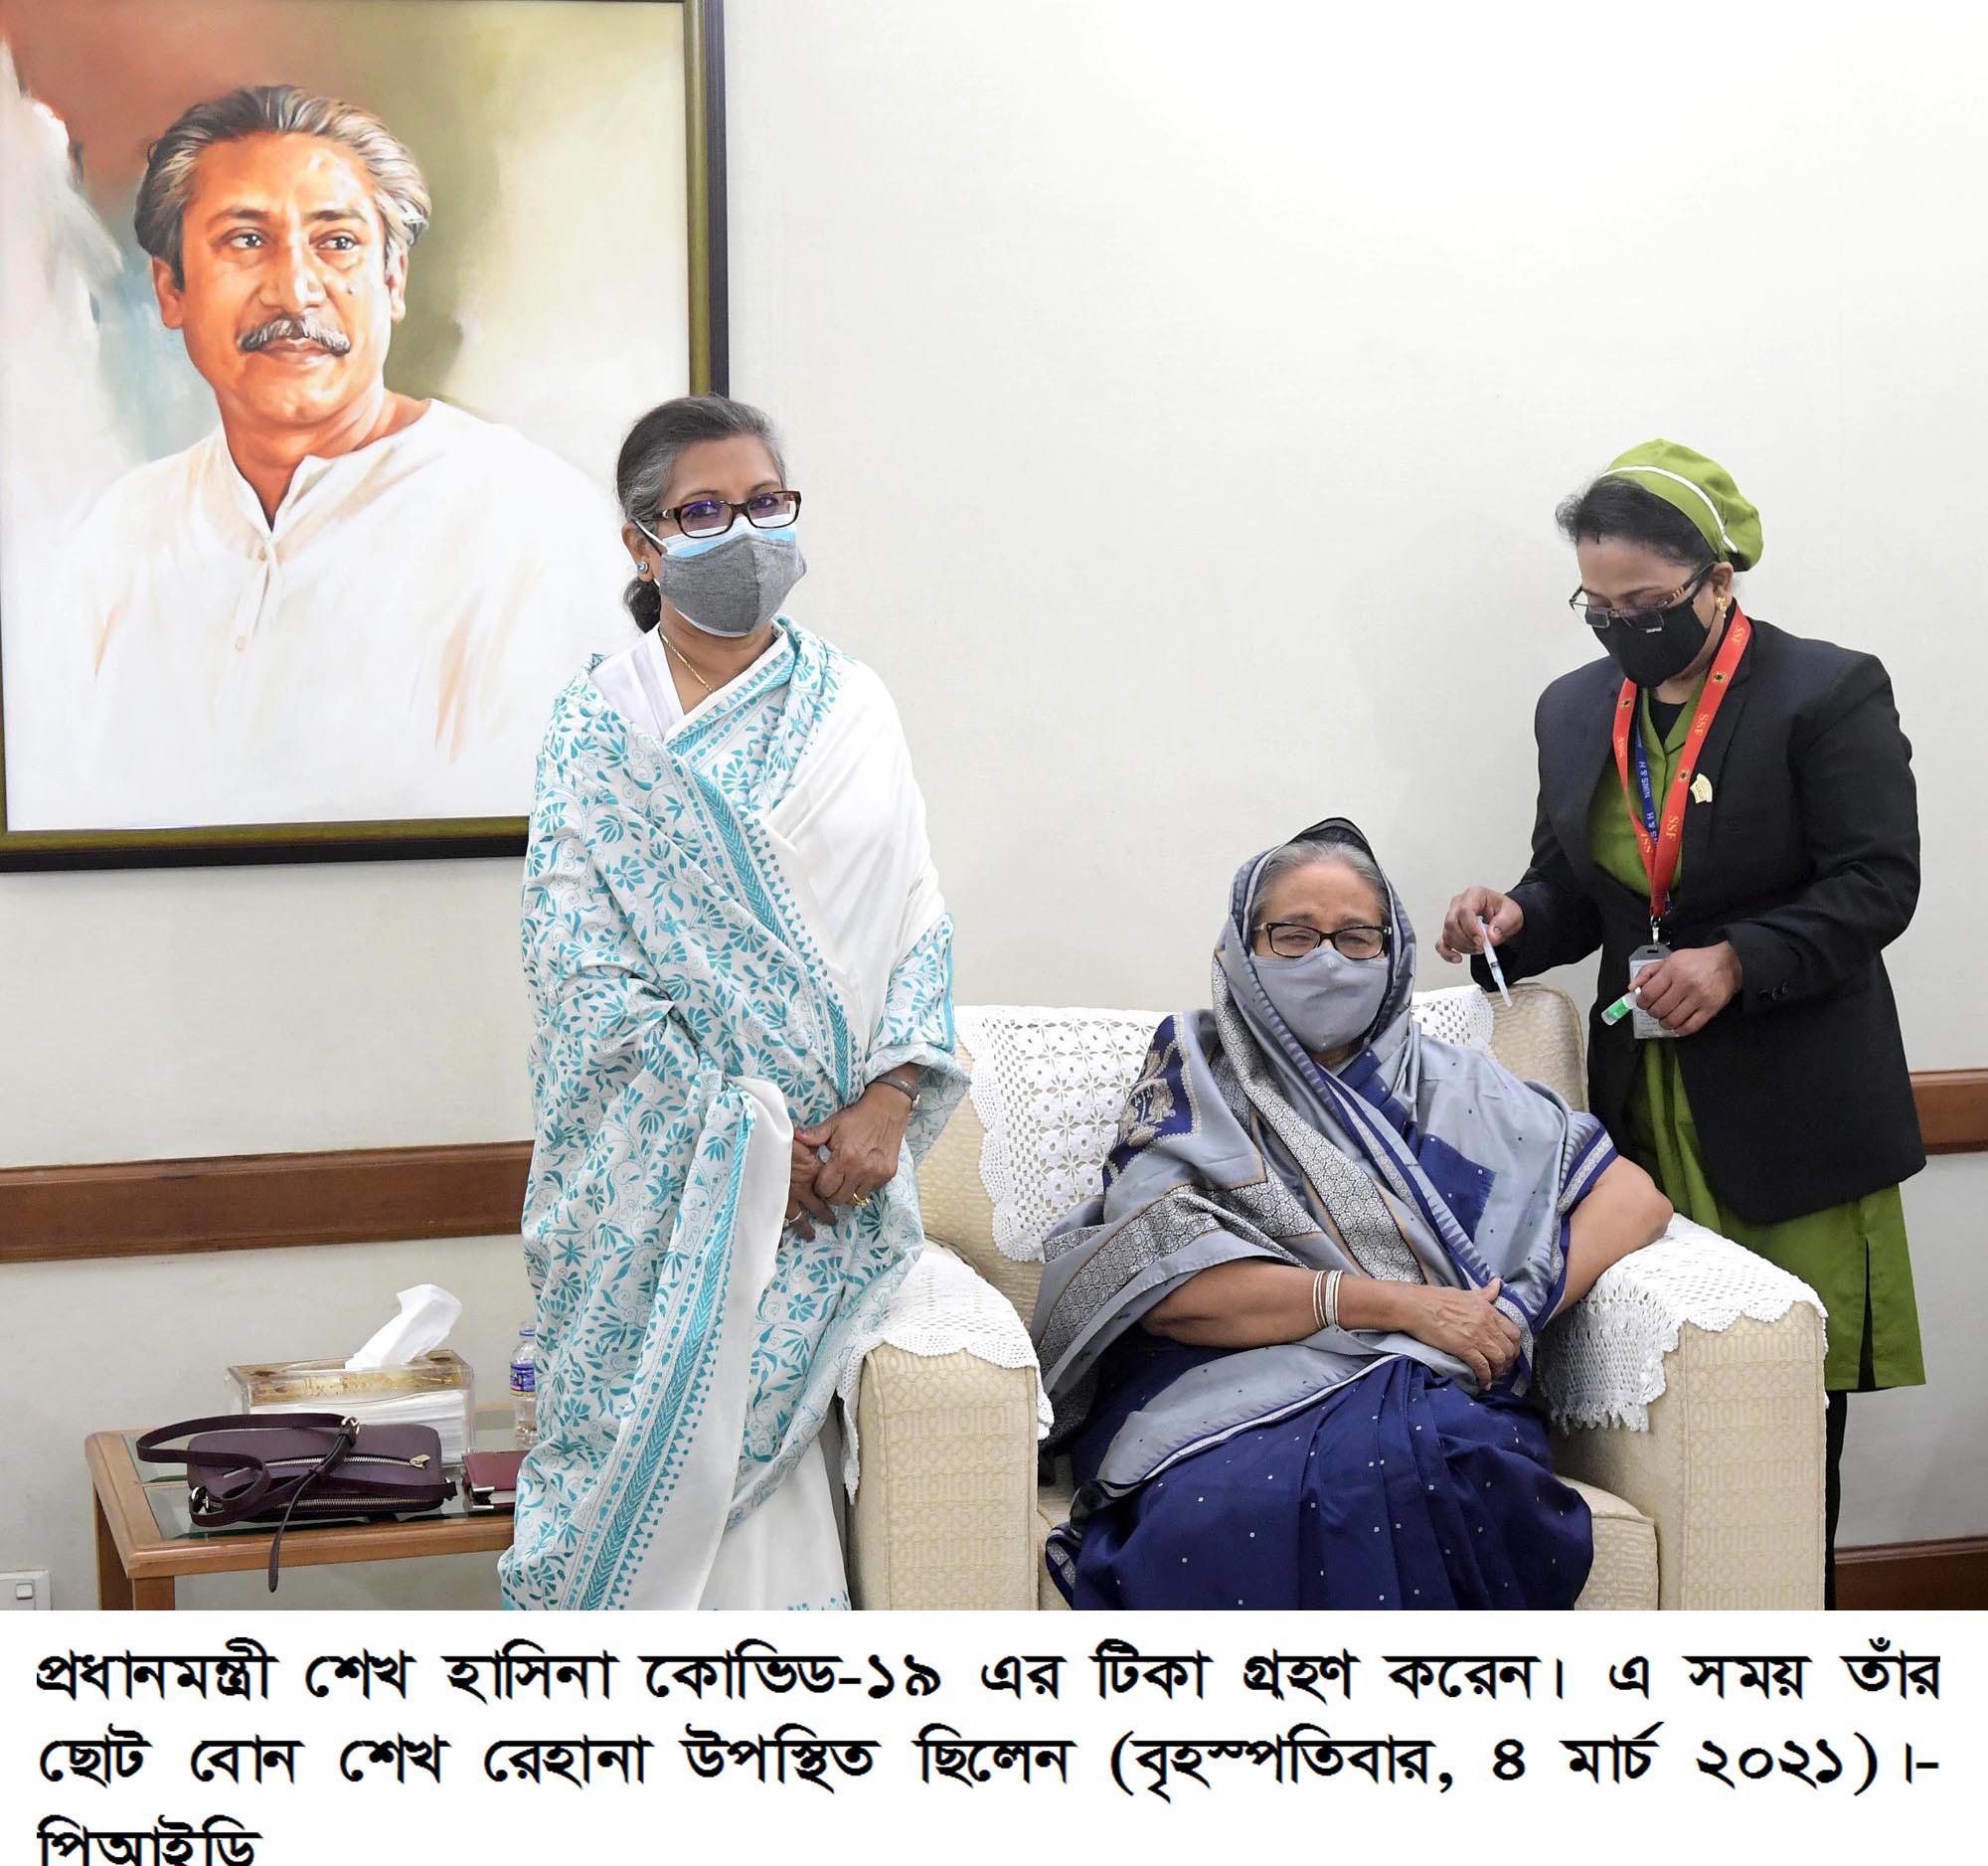 Sheikh Hasina takes COVID-19 vaccine